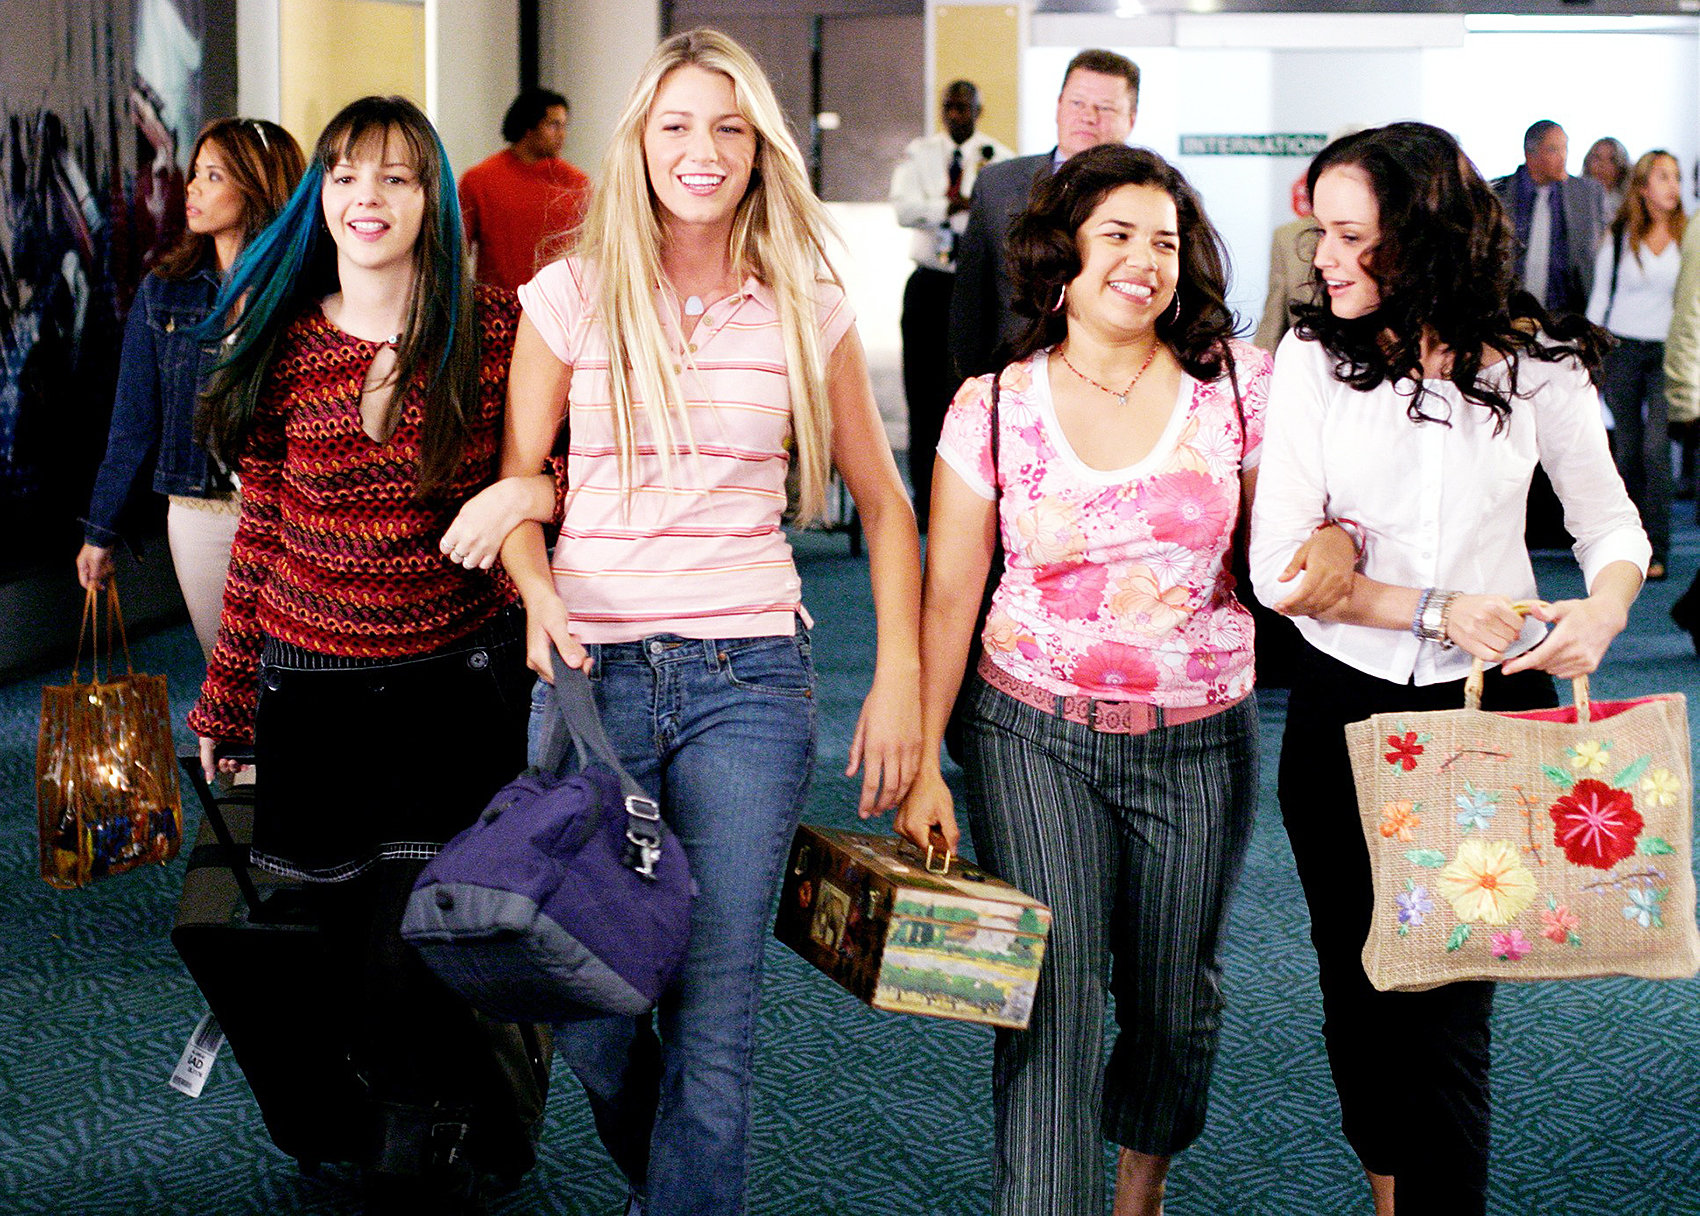 Amber Tamblyn Blake Lively America Ferrera Alexis Bledel Sisterhood Of The Traveling Pants